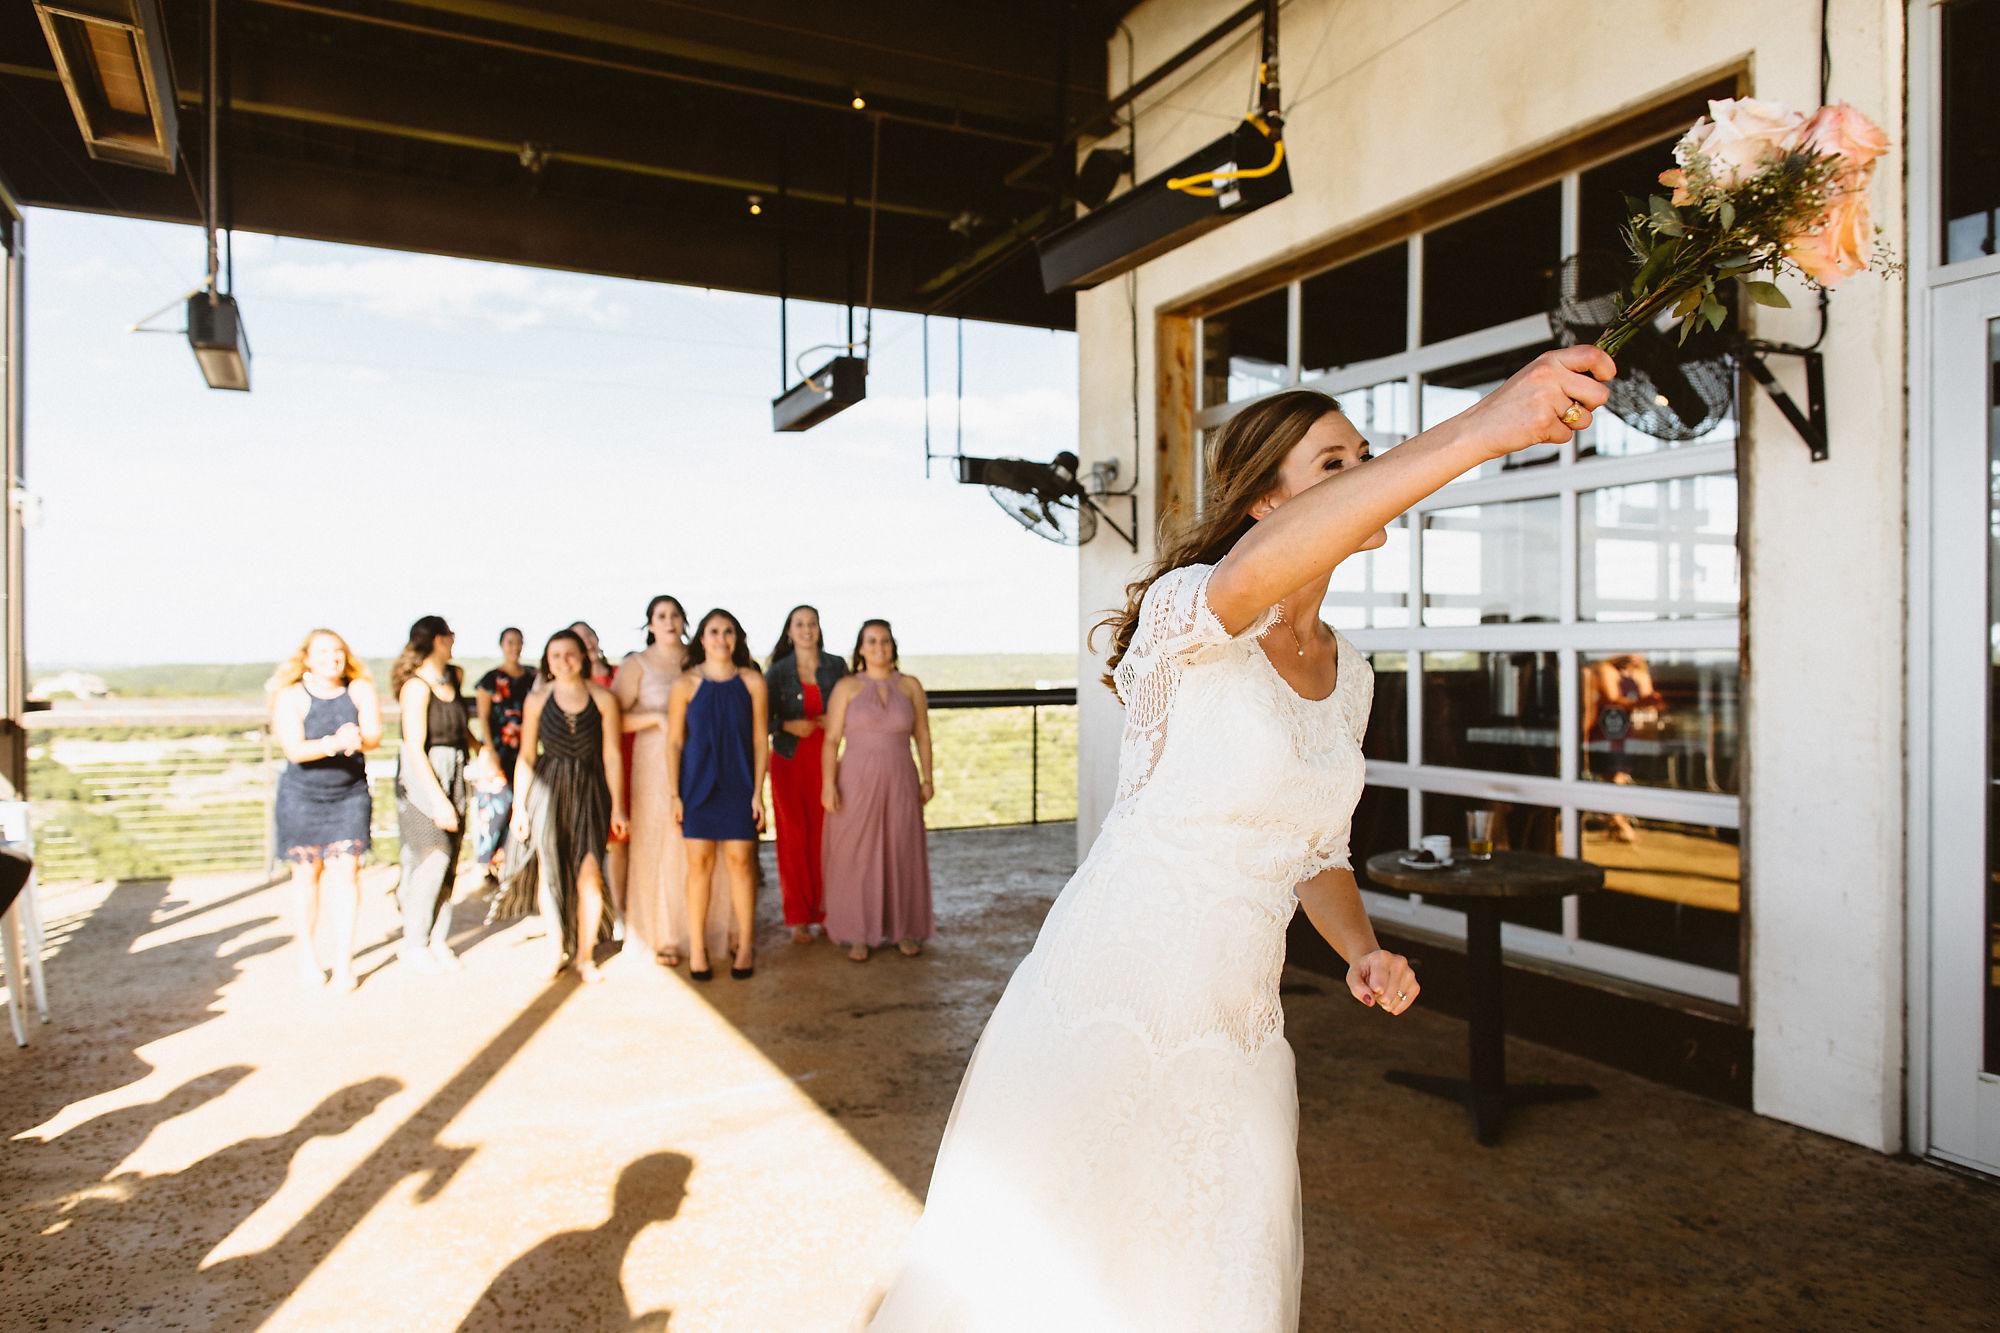 jessica_austin_oasis_brewery_wedding_photos162346.jpg